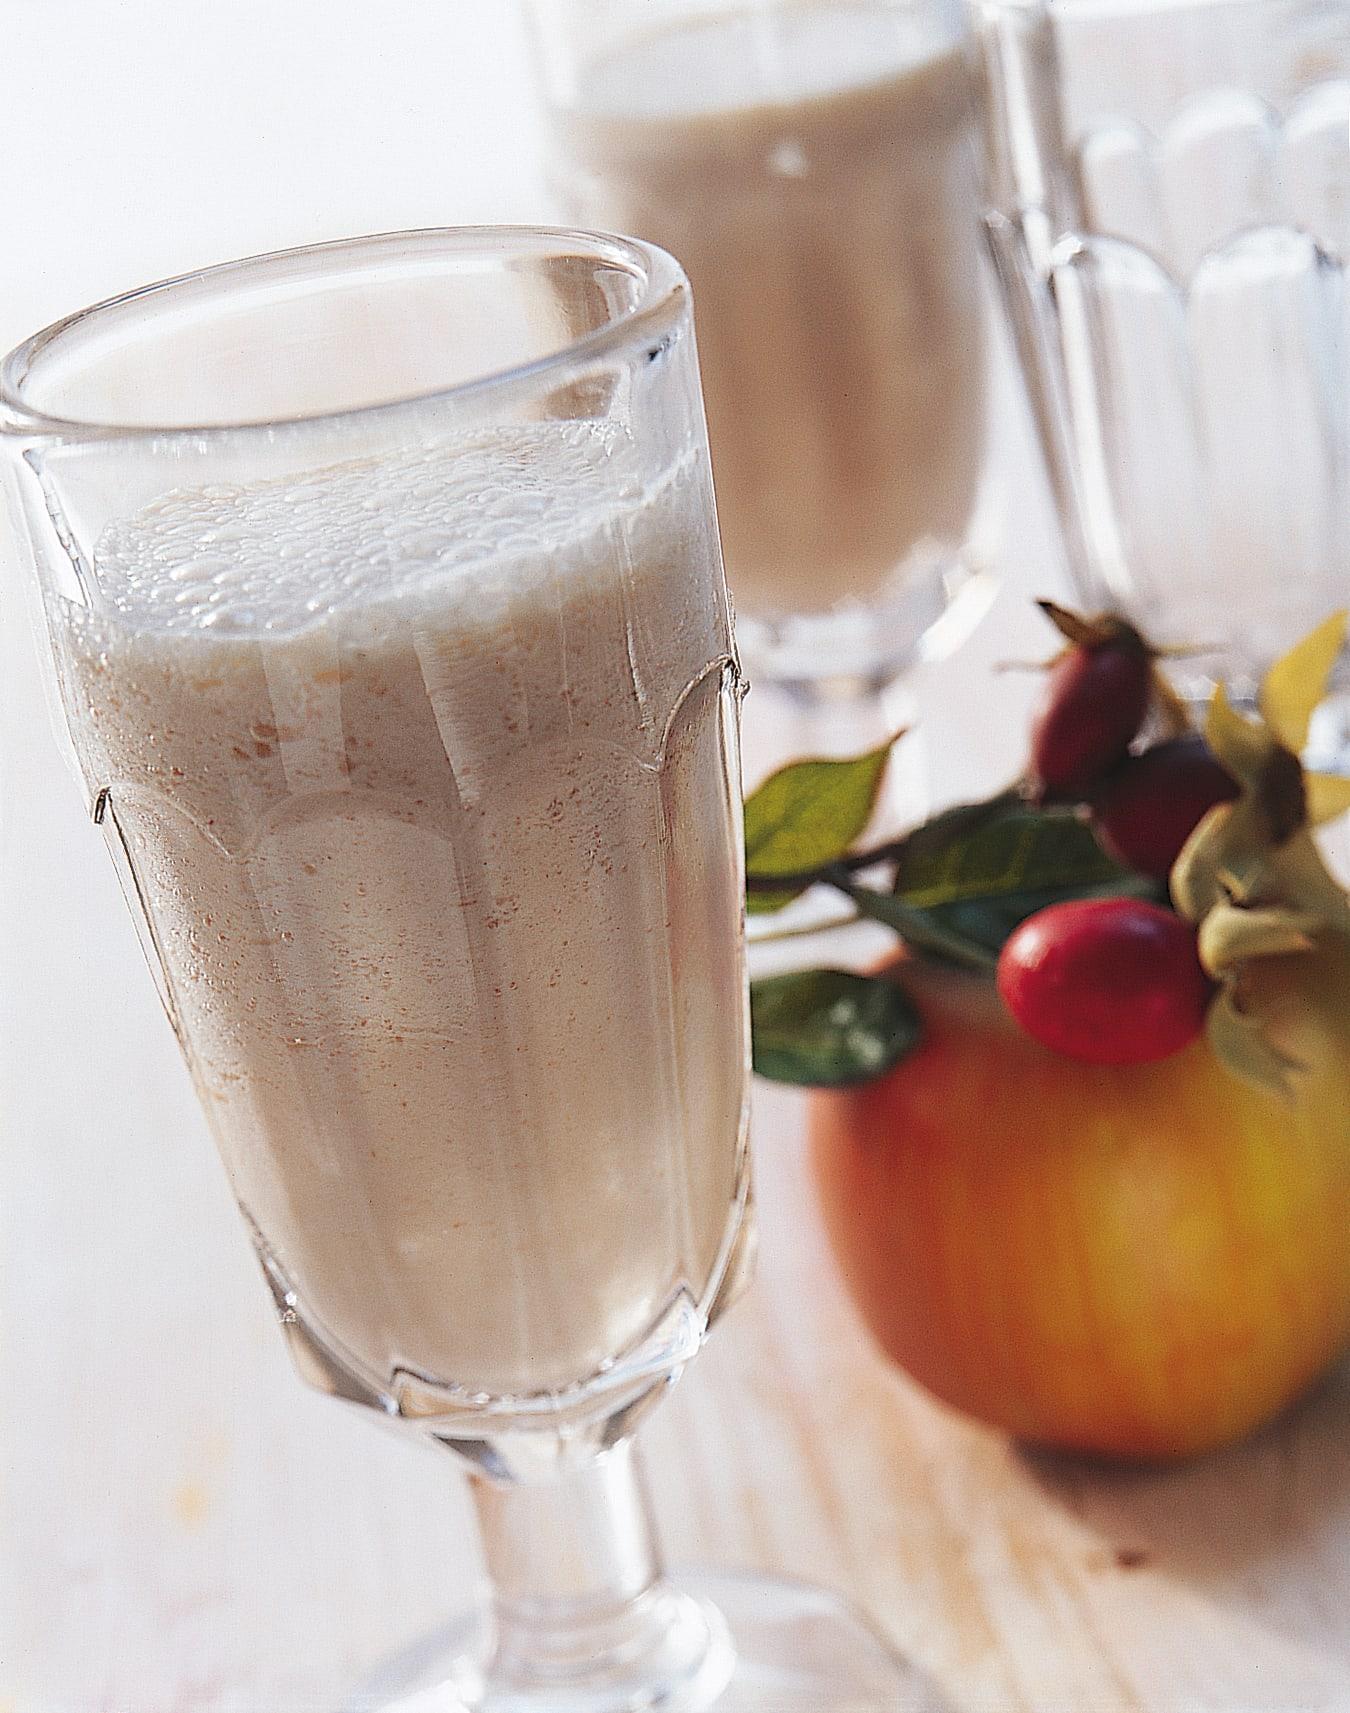 Milkshake aux pommes et au cynorrhodon